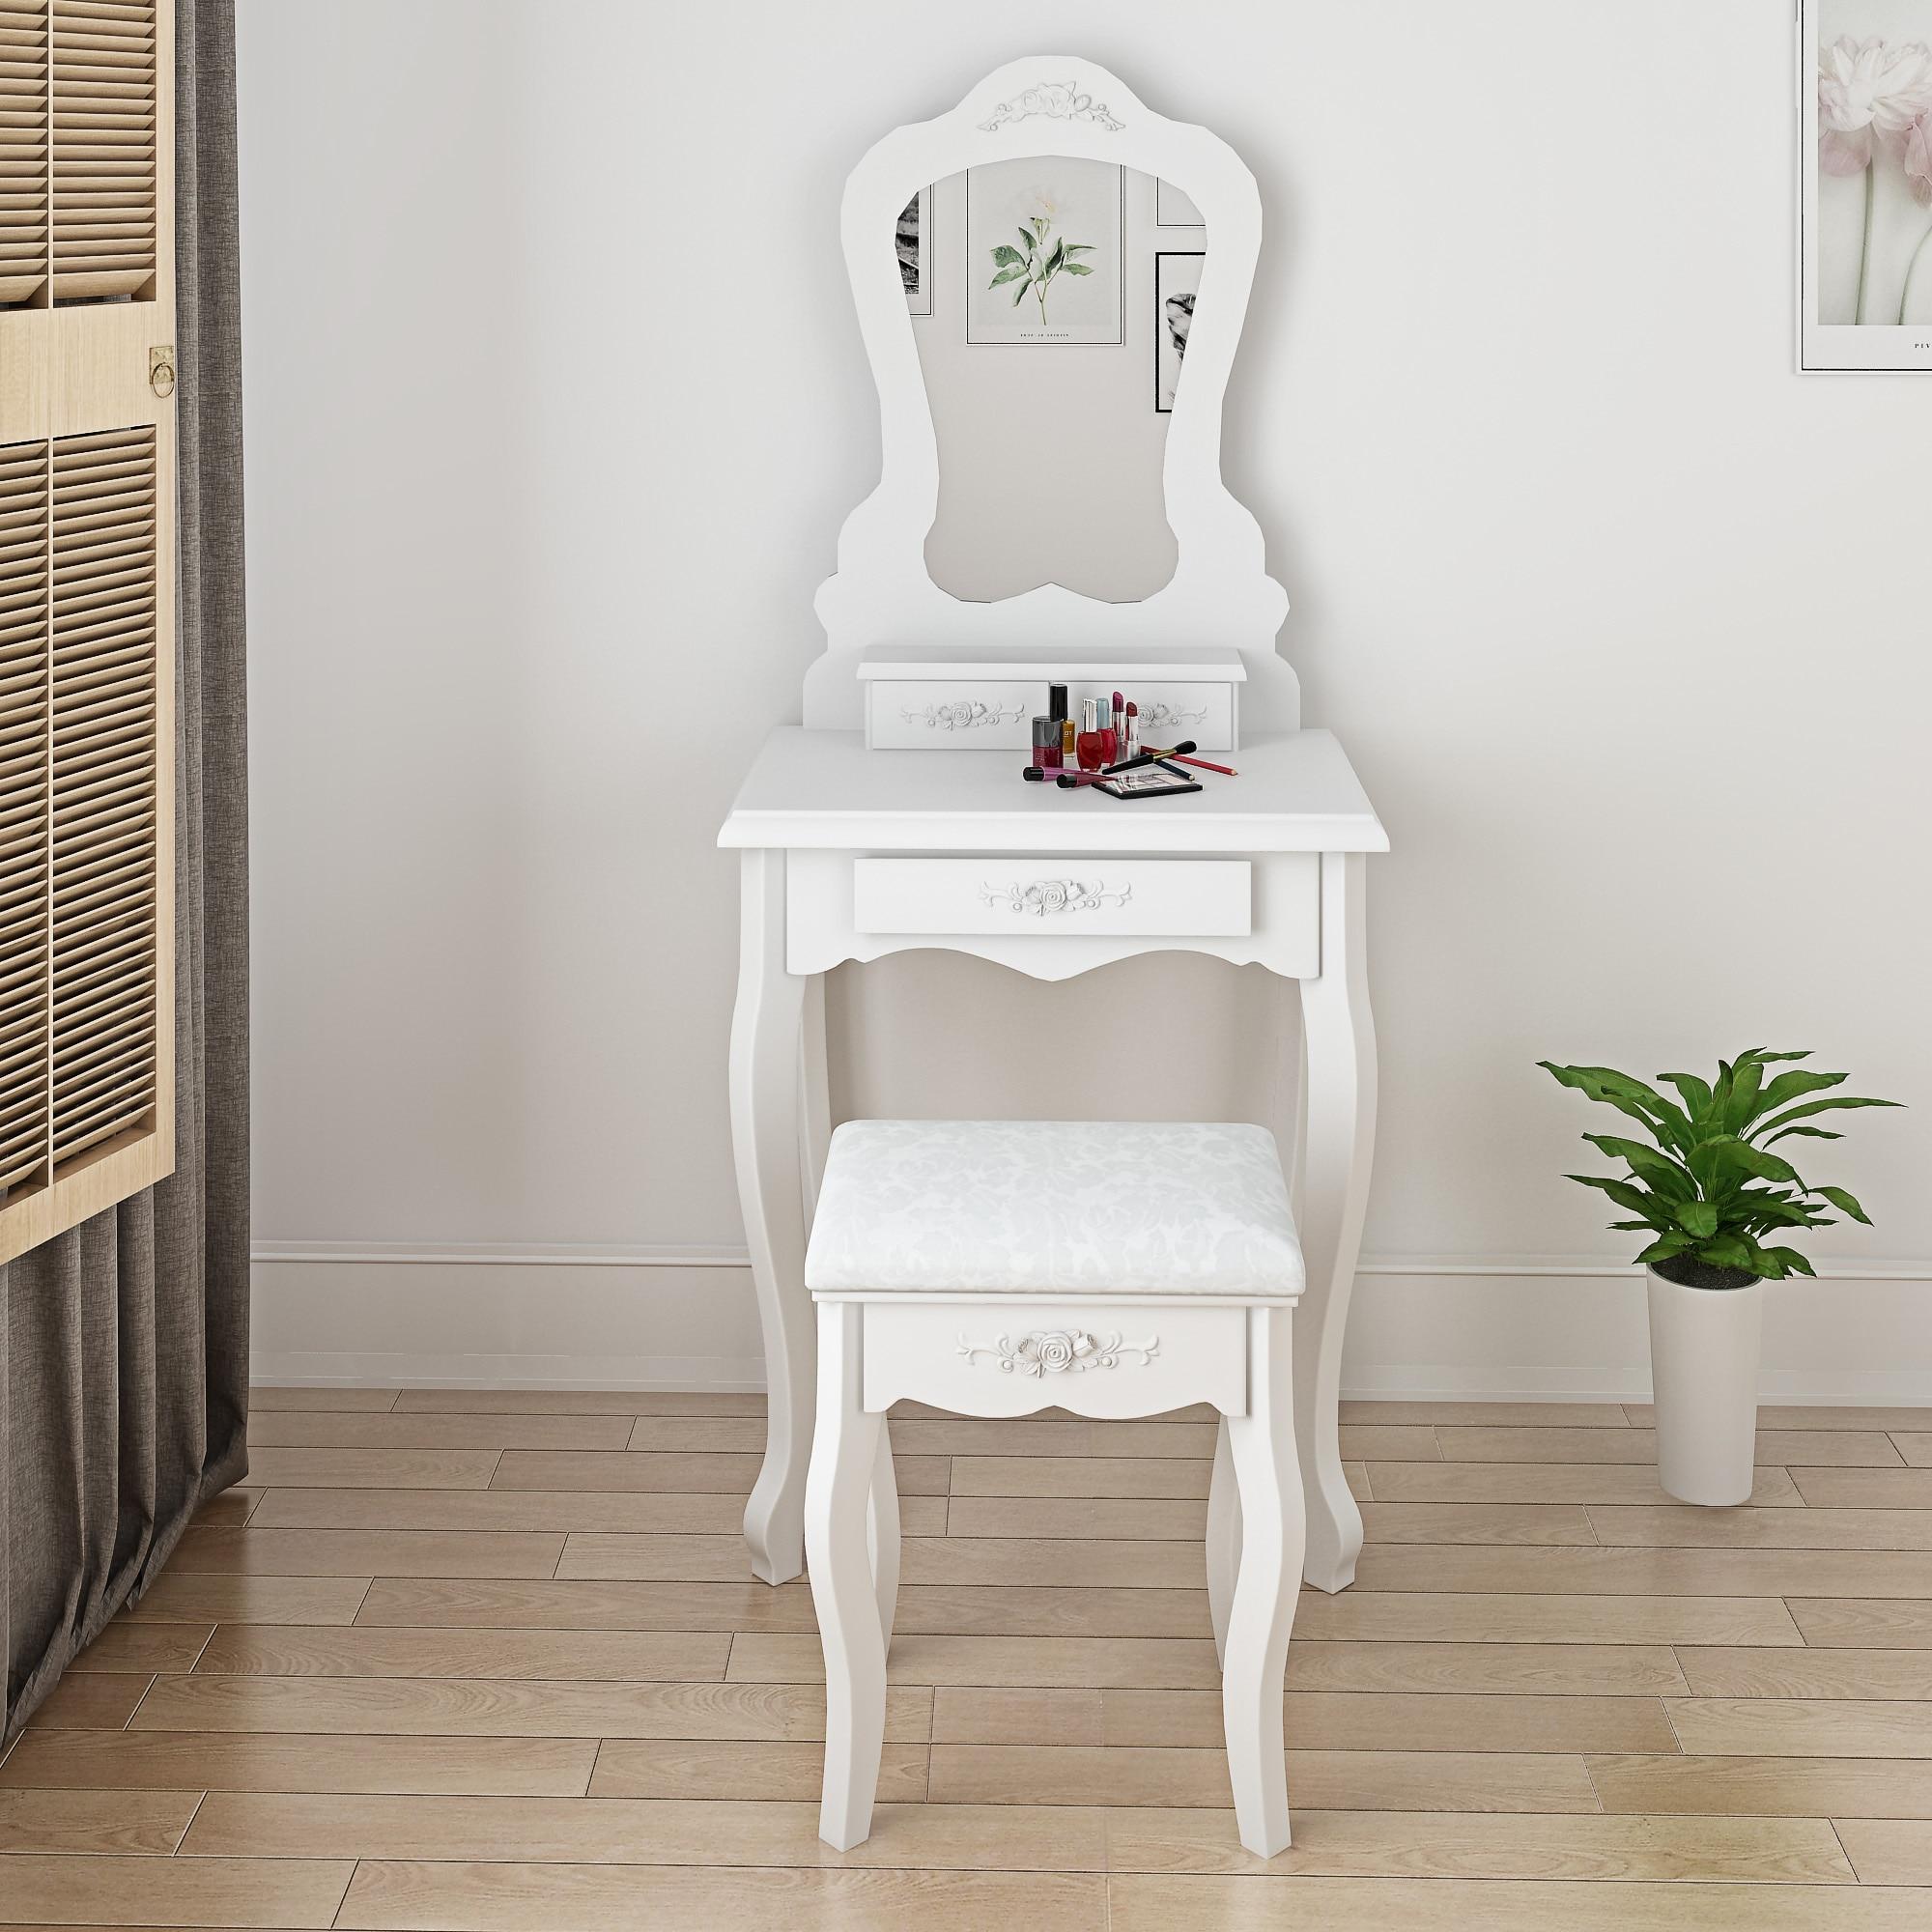 Panana Princess Girls Dressing Table Premium Quality Makeup Table & Stool Mirror Little Kid Bedroom King Girls Gift